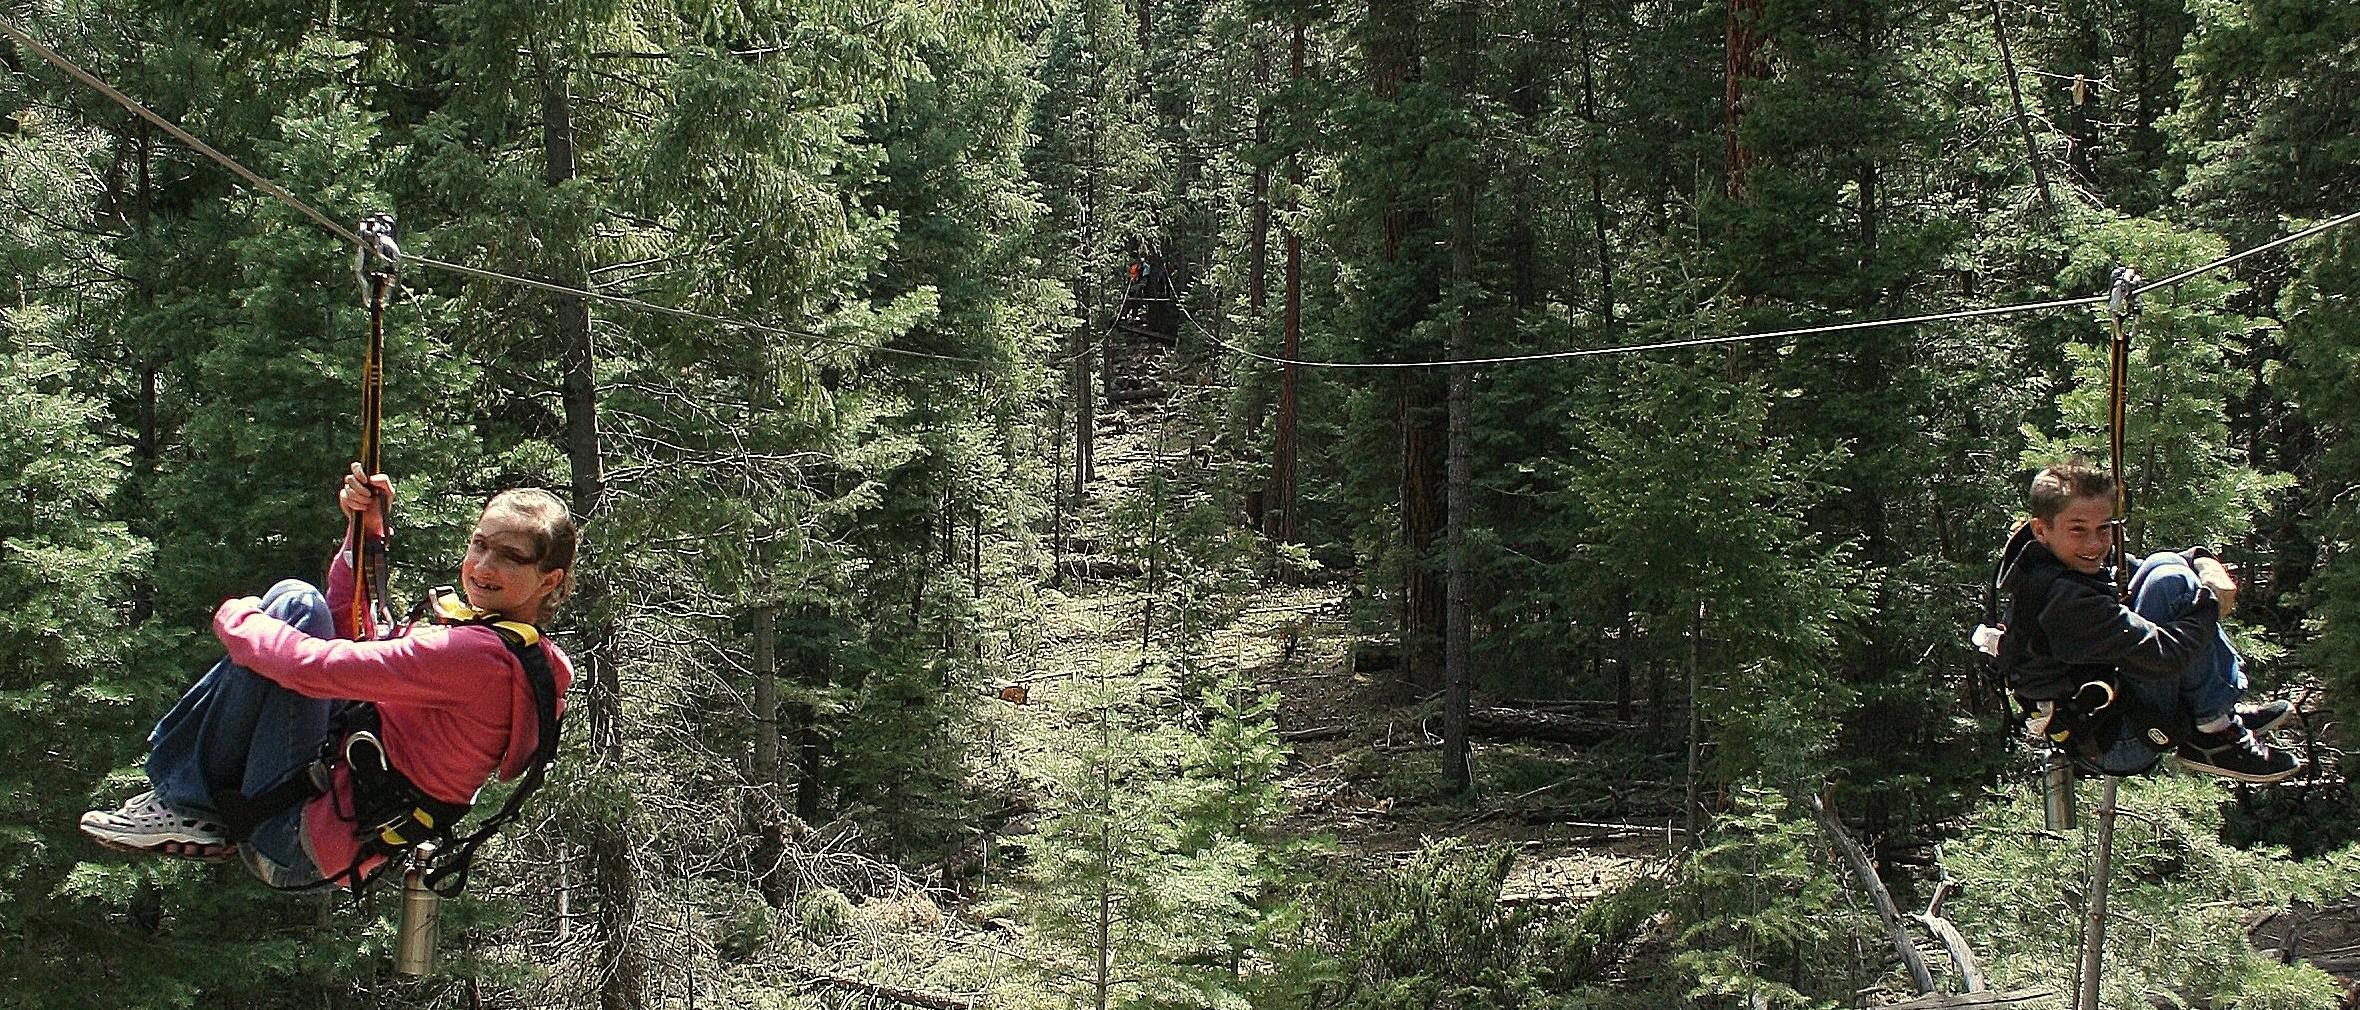 A boy and girl race down zipline spans.